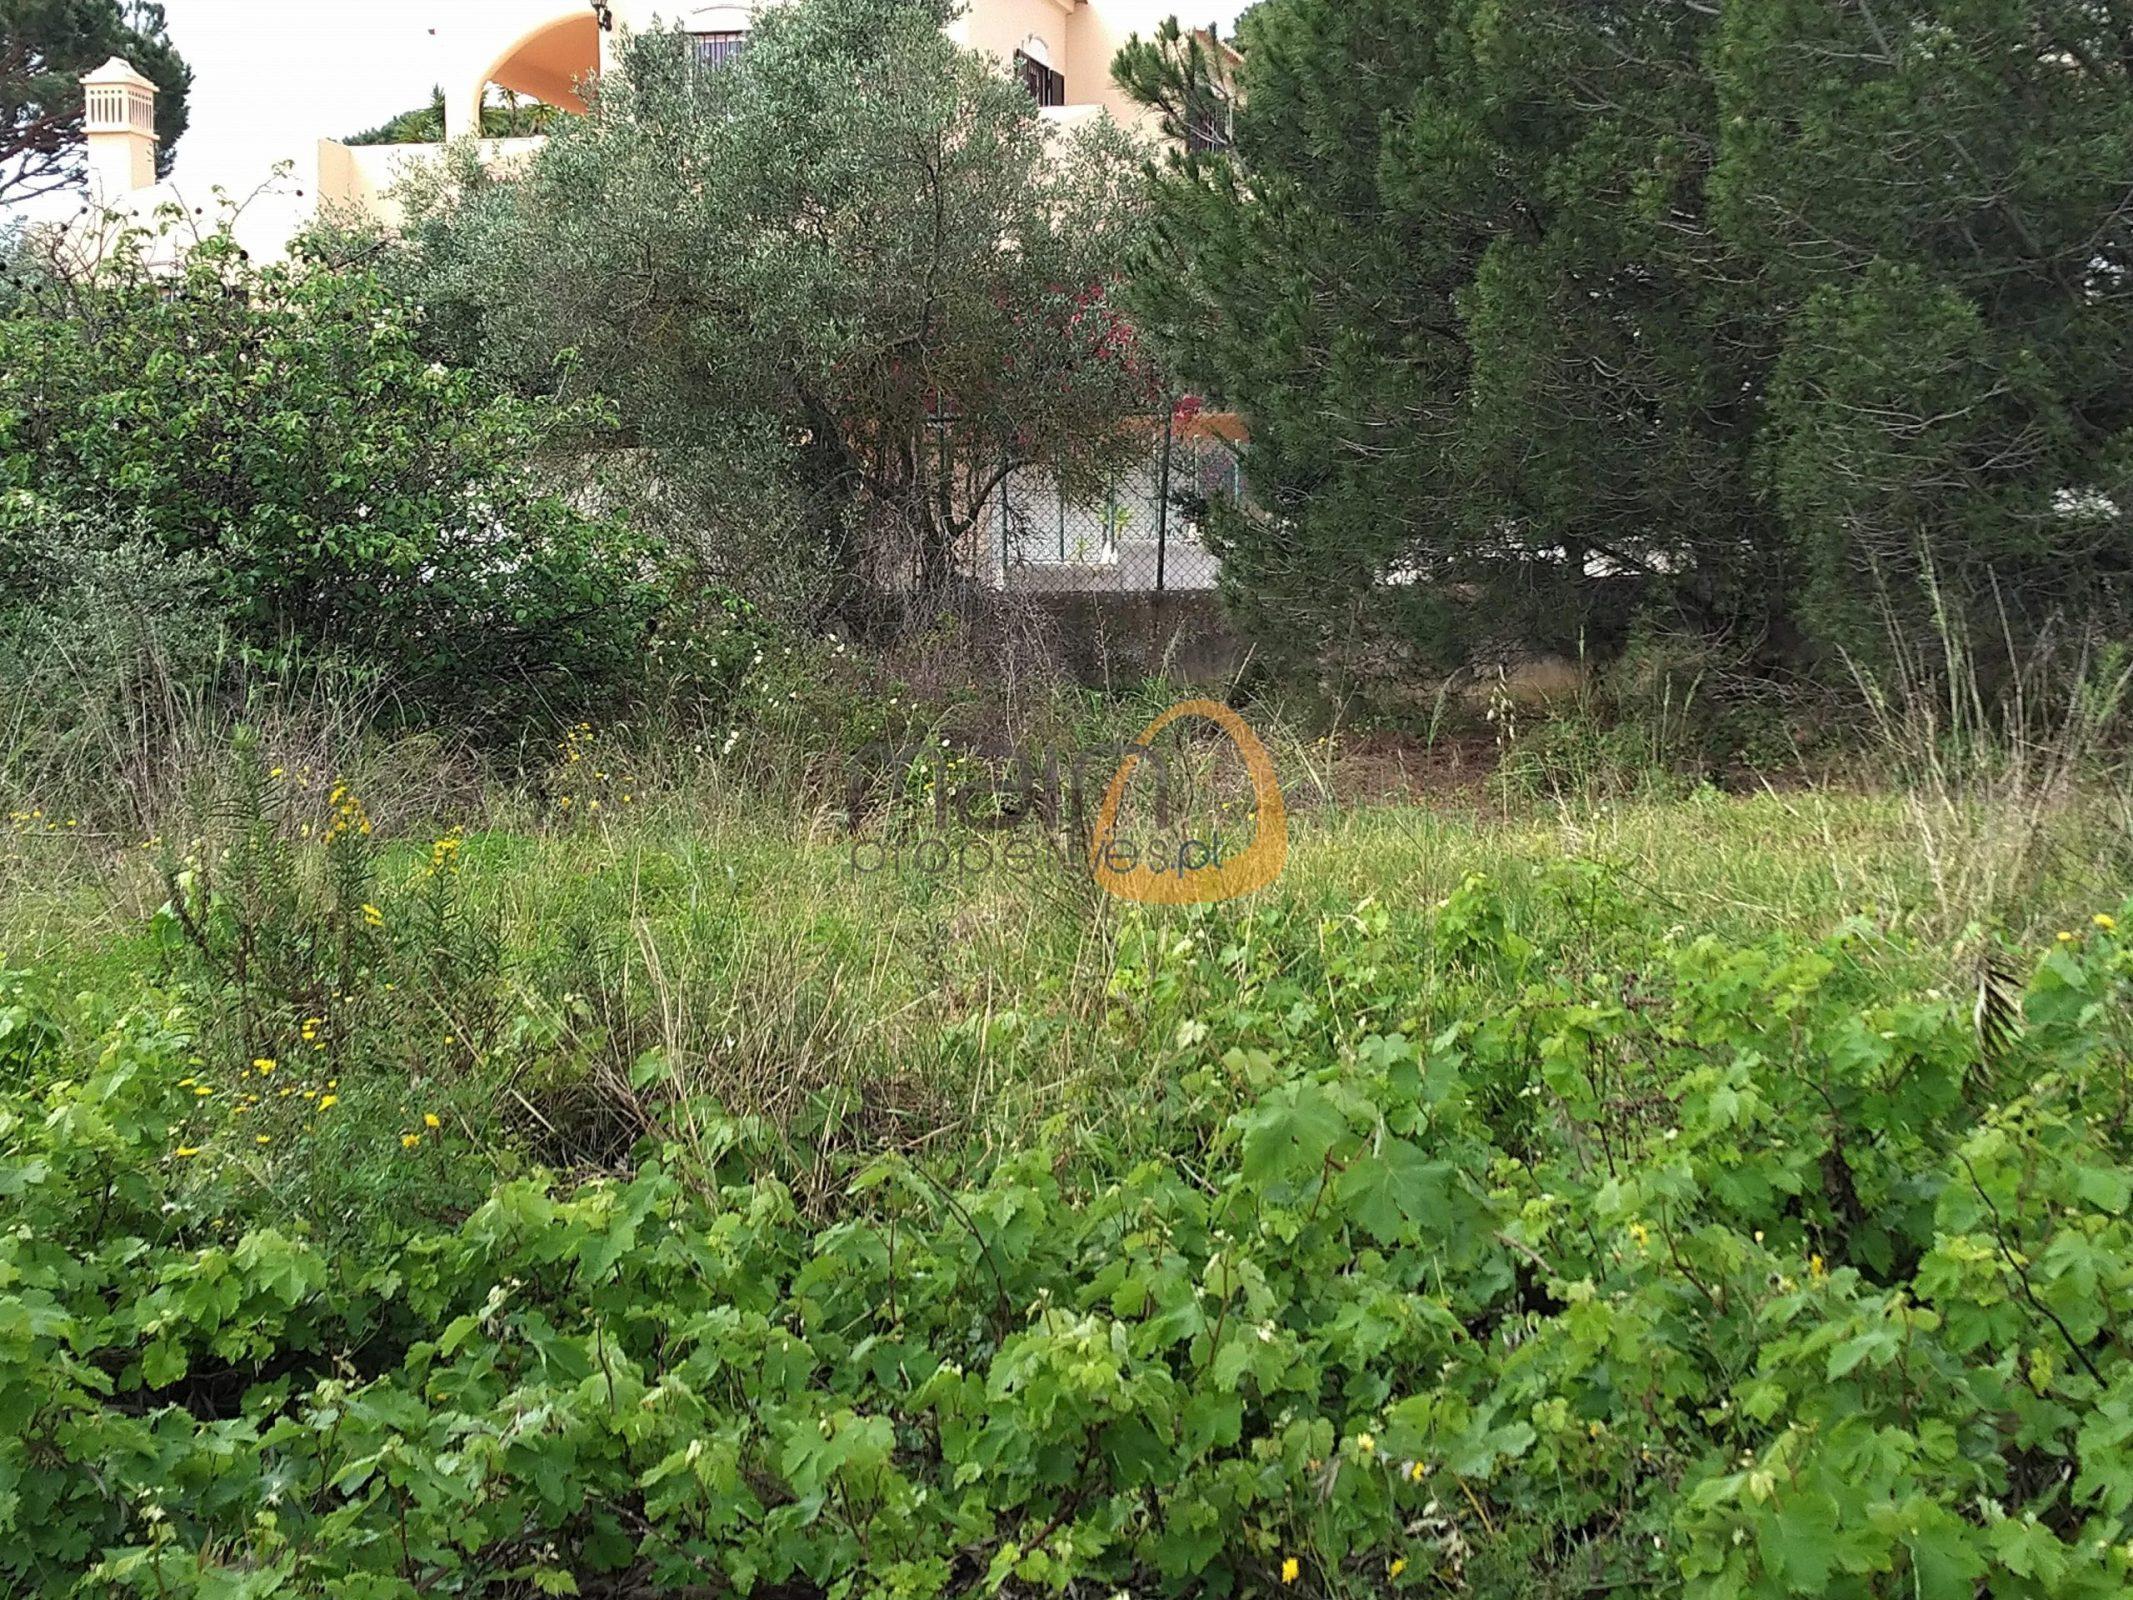 [:pt]Terreno para construção de moradia em Montenegro - Faro : Algarve : Portugal : Terreno 15 :: MR039[:en]Land for Villa construction in Montenegro -  Faro : Algarve : Portugal :: Land 15 :: MainProperties :: MR039[:]